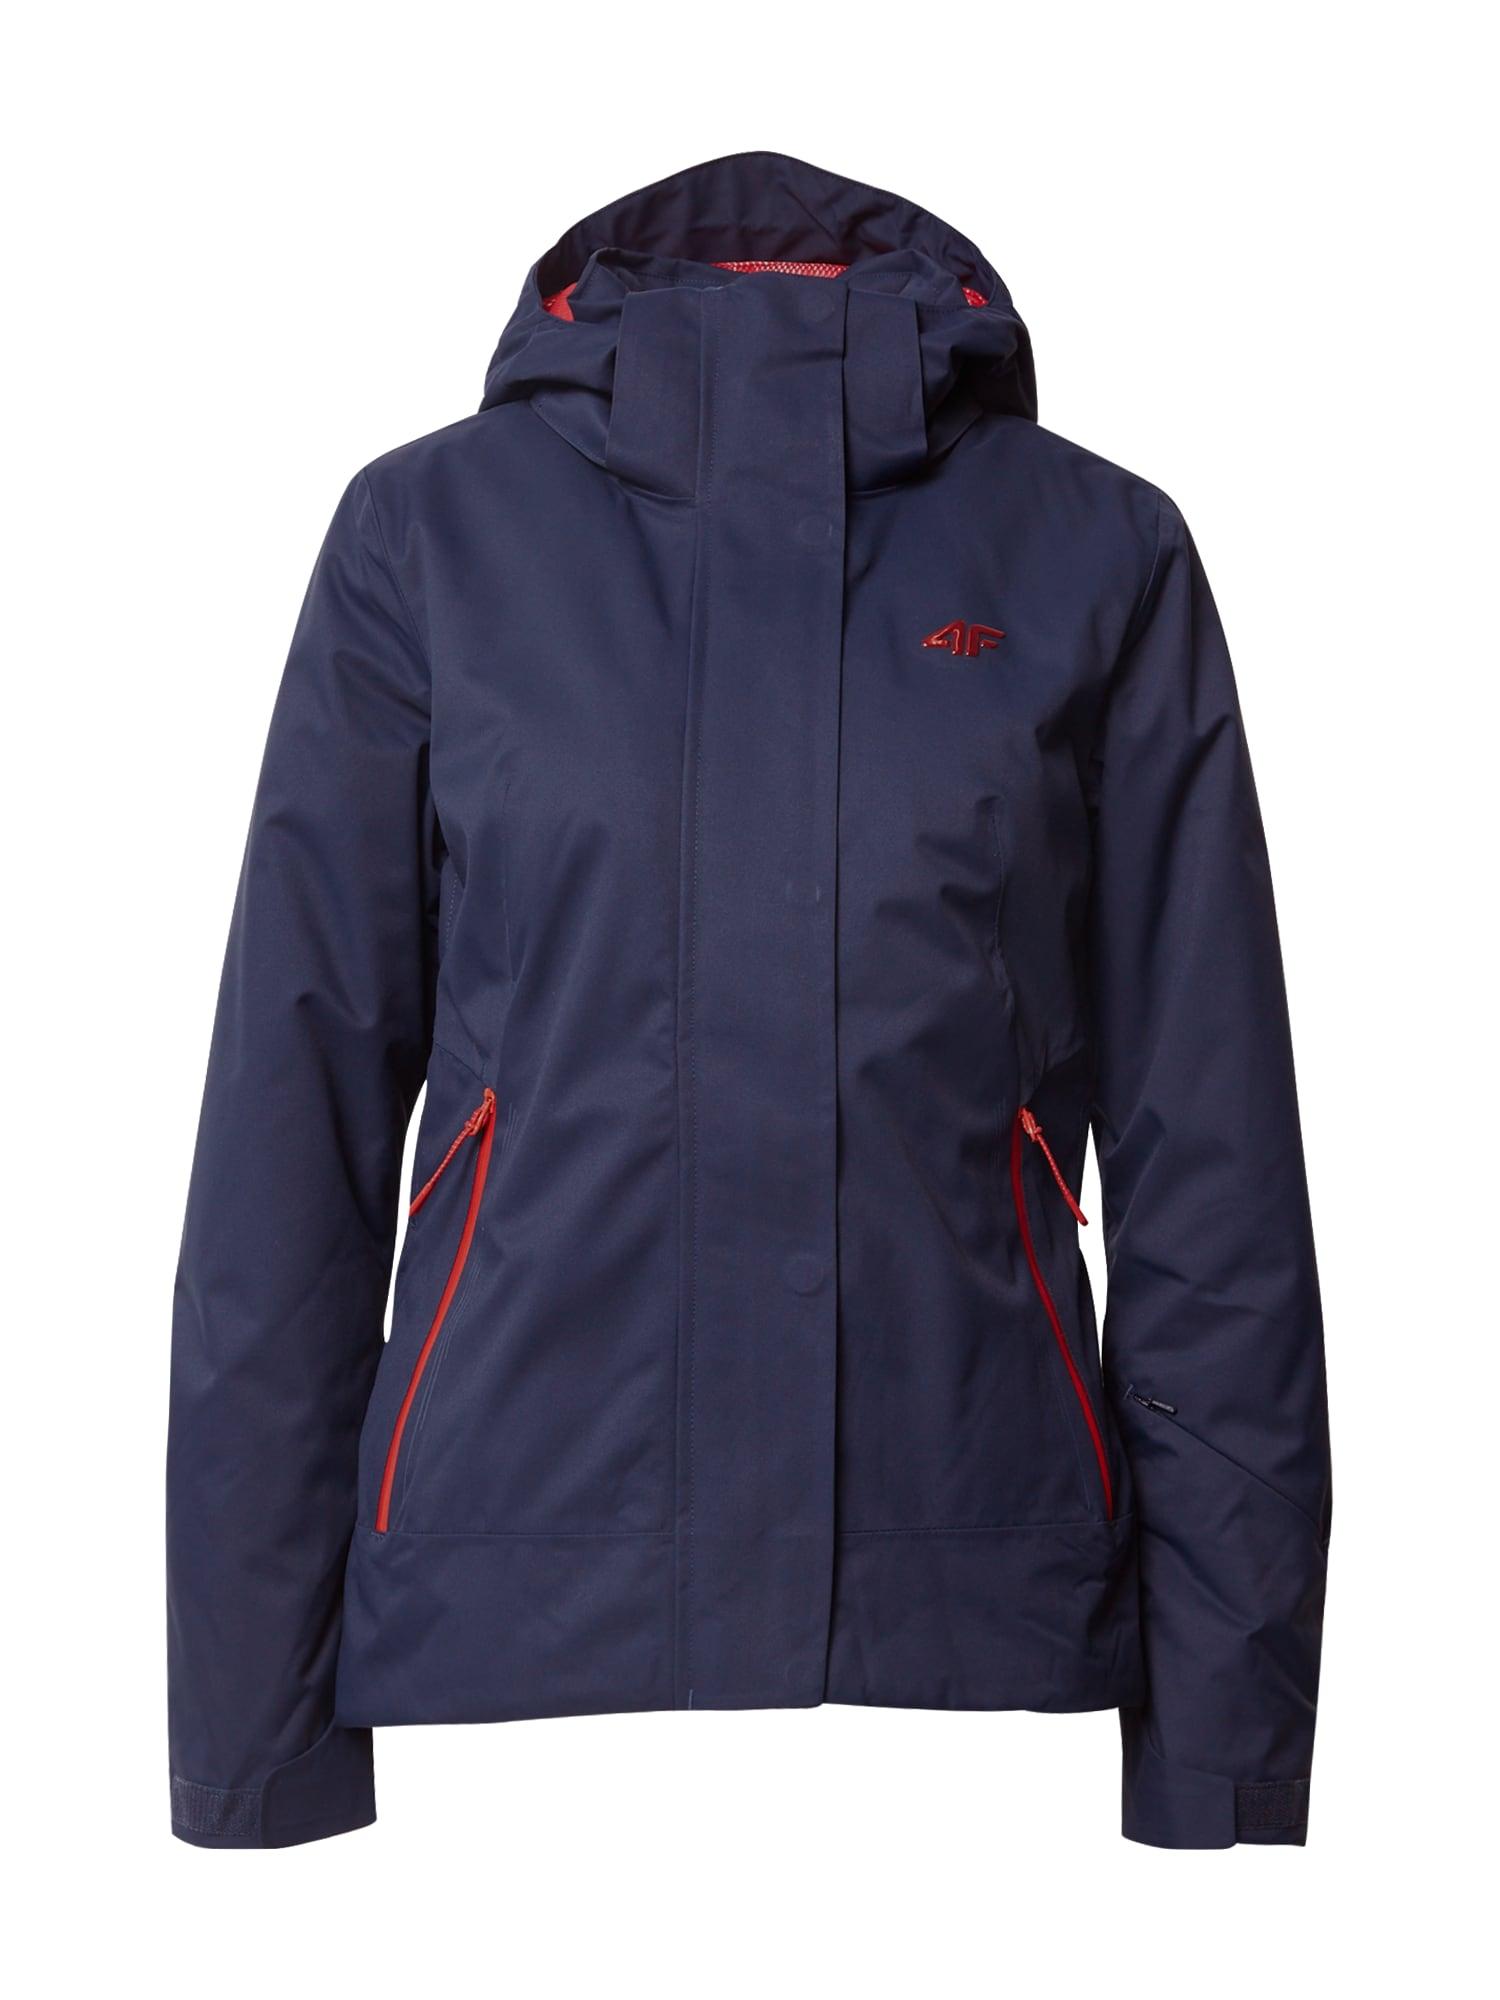 4F Outdoorová bunda  tmavě modrá